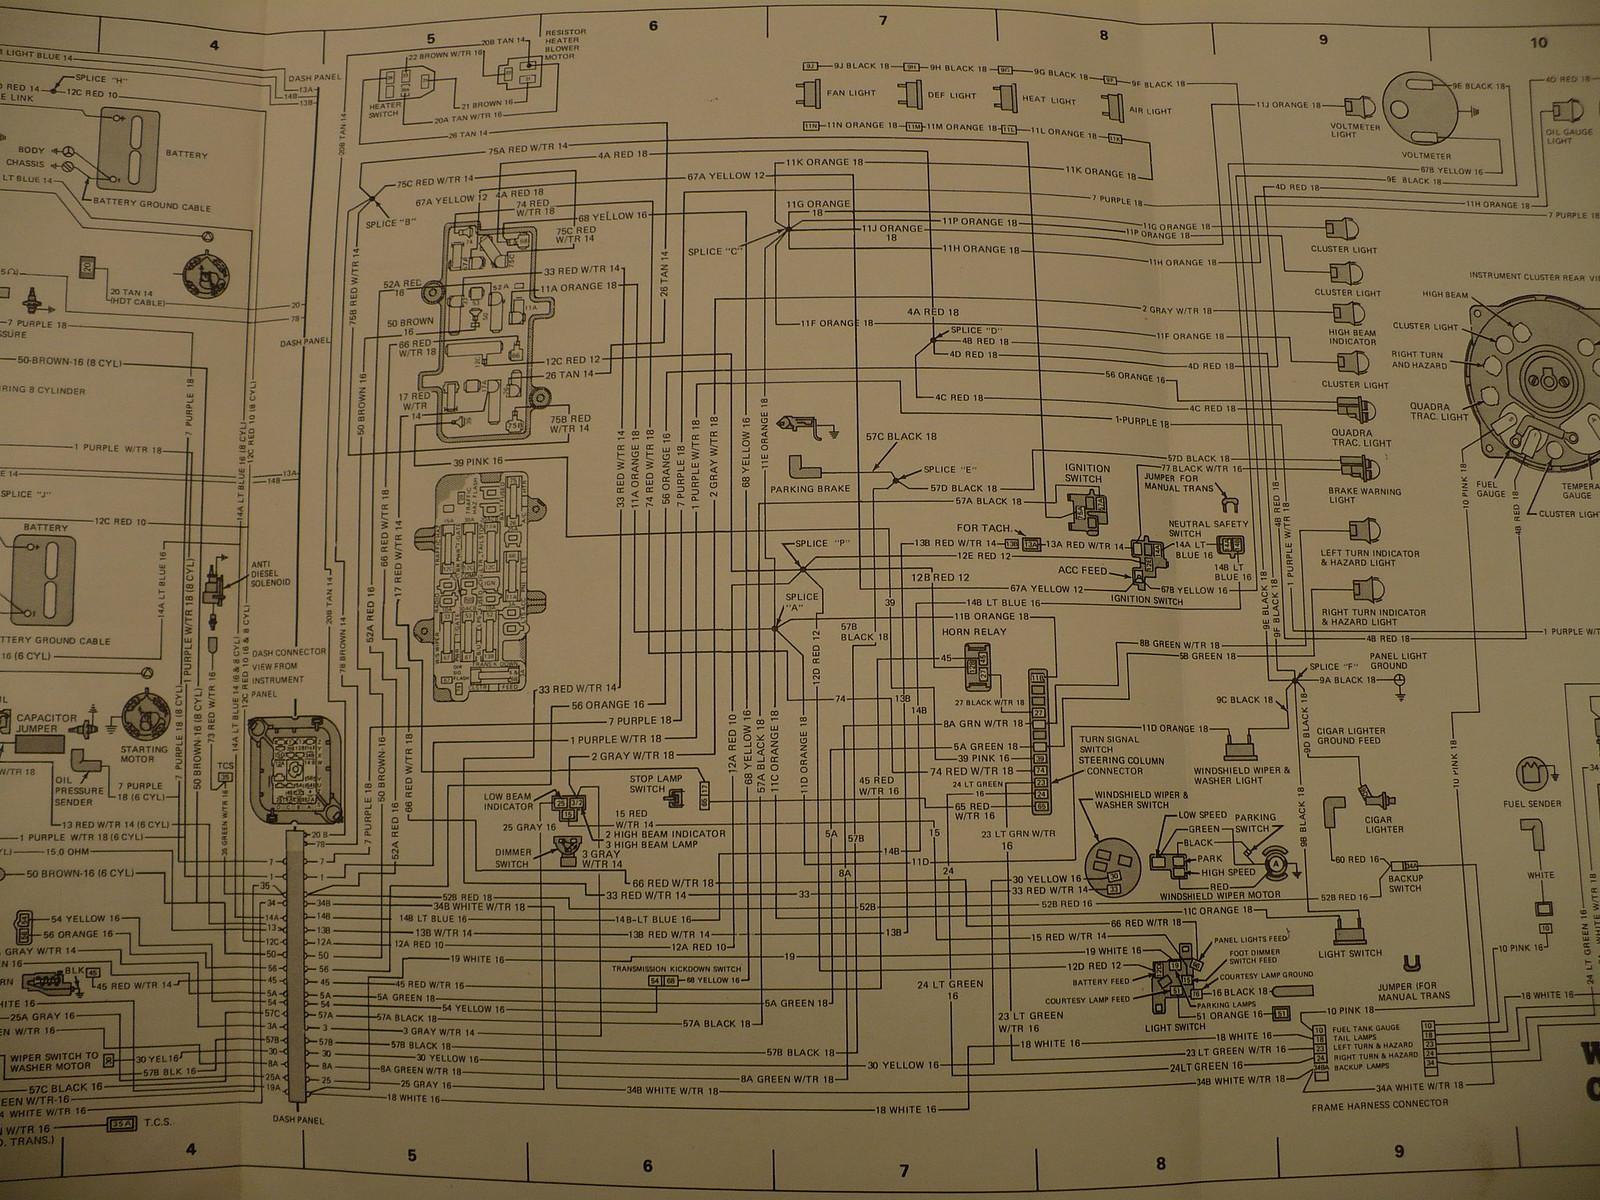 hight resolution of 1978 cj 5 wiring diagram needed jeepforum com 78 cj5 wiring diagram